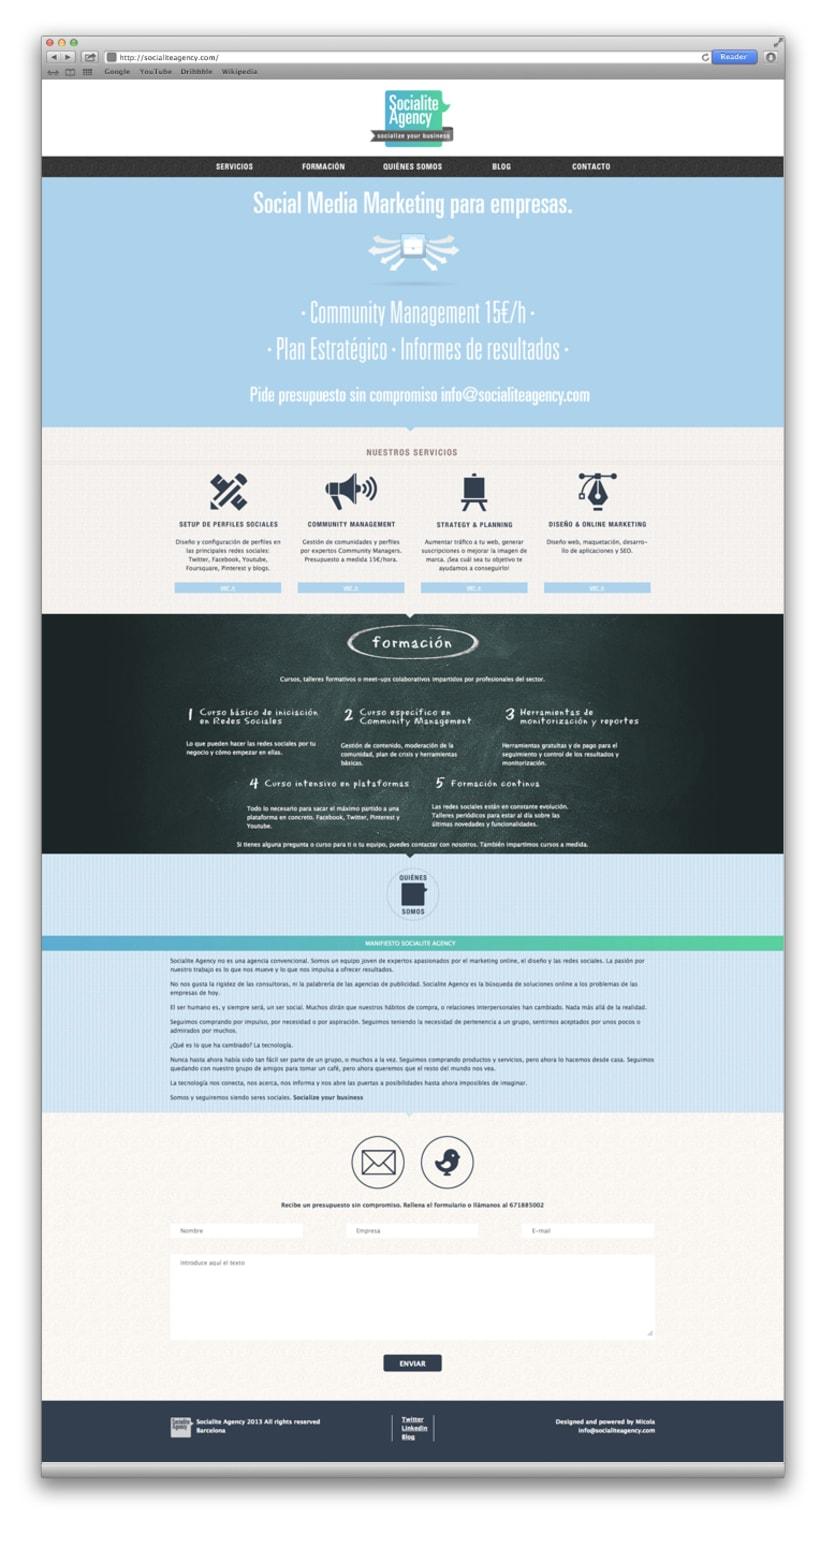 Socialite Agency -1